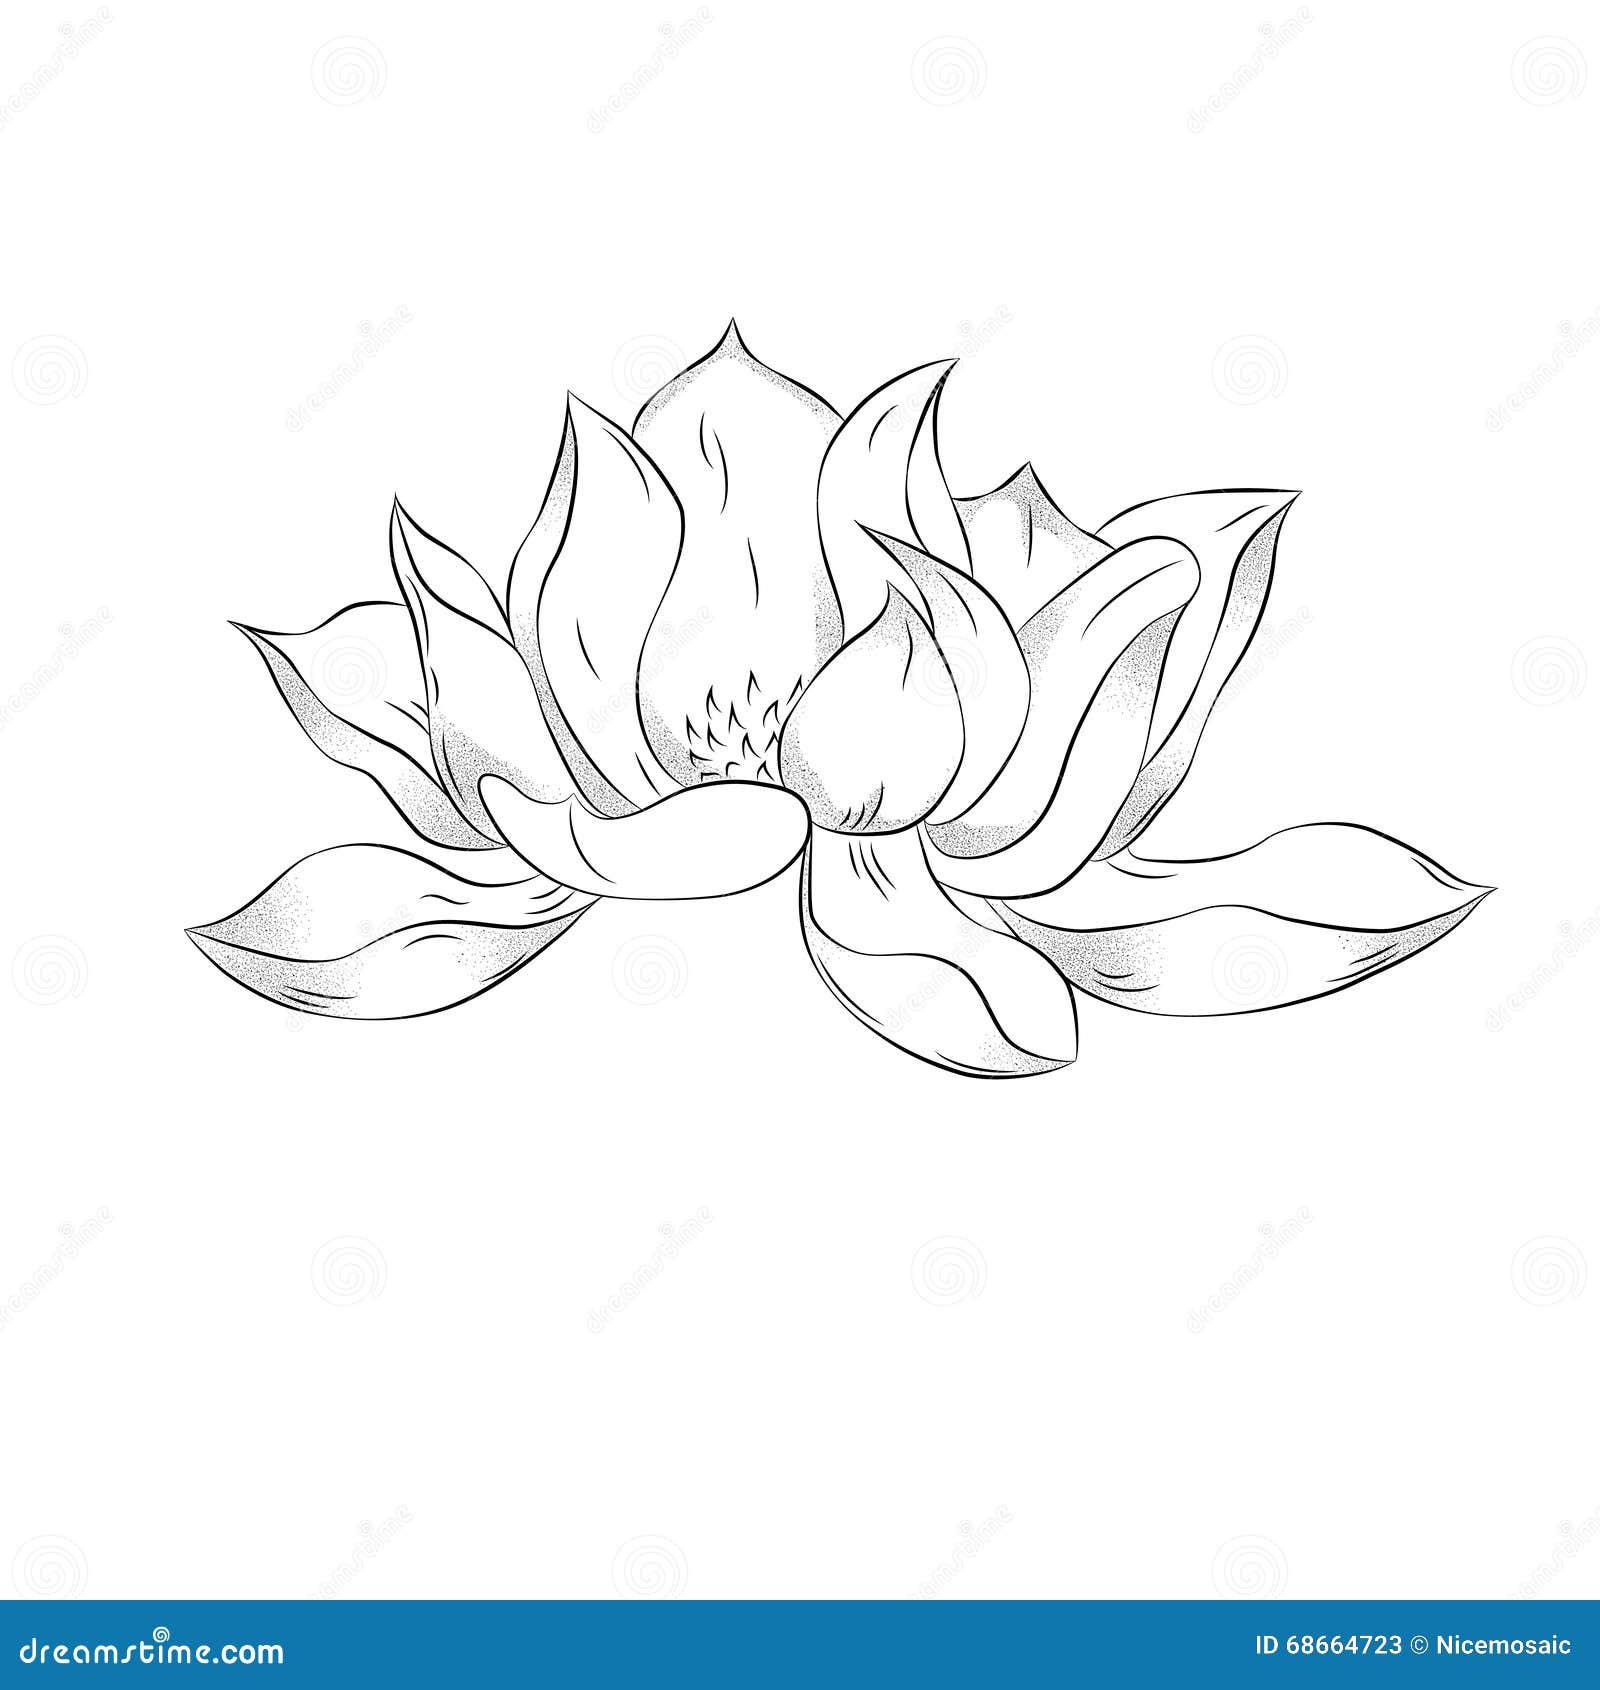 Lotus flower hand drawn illustration with stipple effect vinta lotus flower hand drawn illustration with stipple effect vinta mightylinksfo